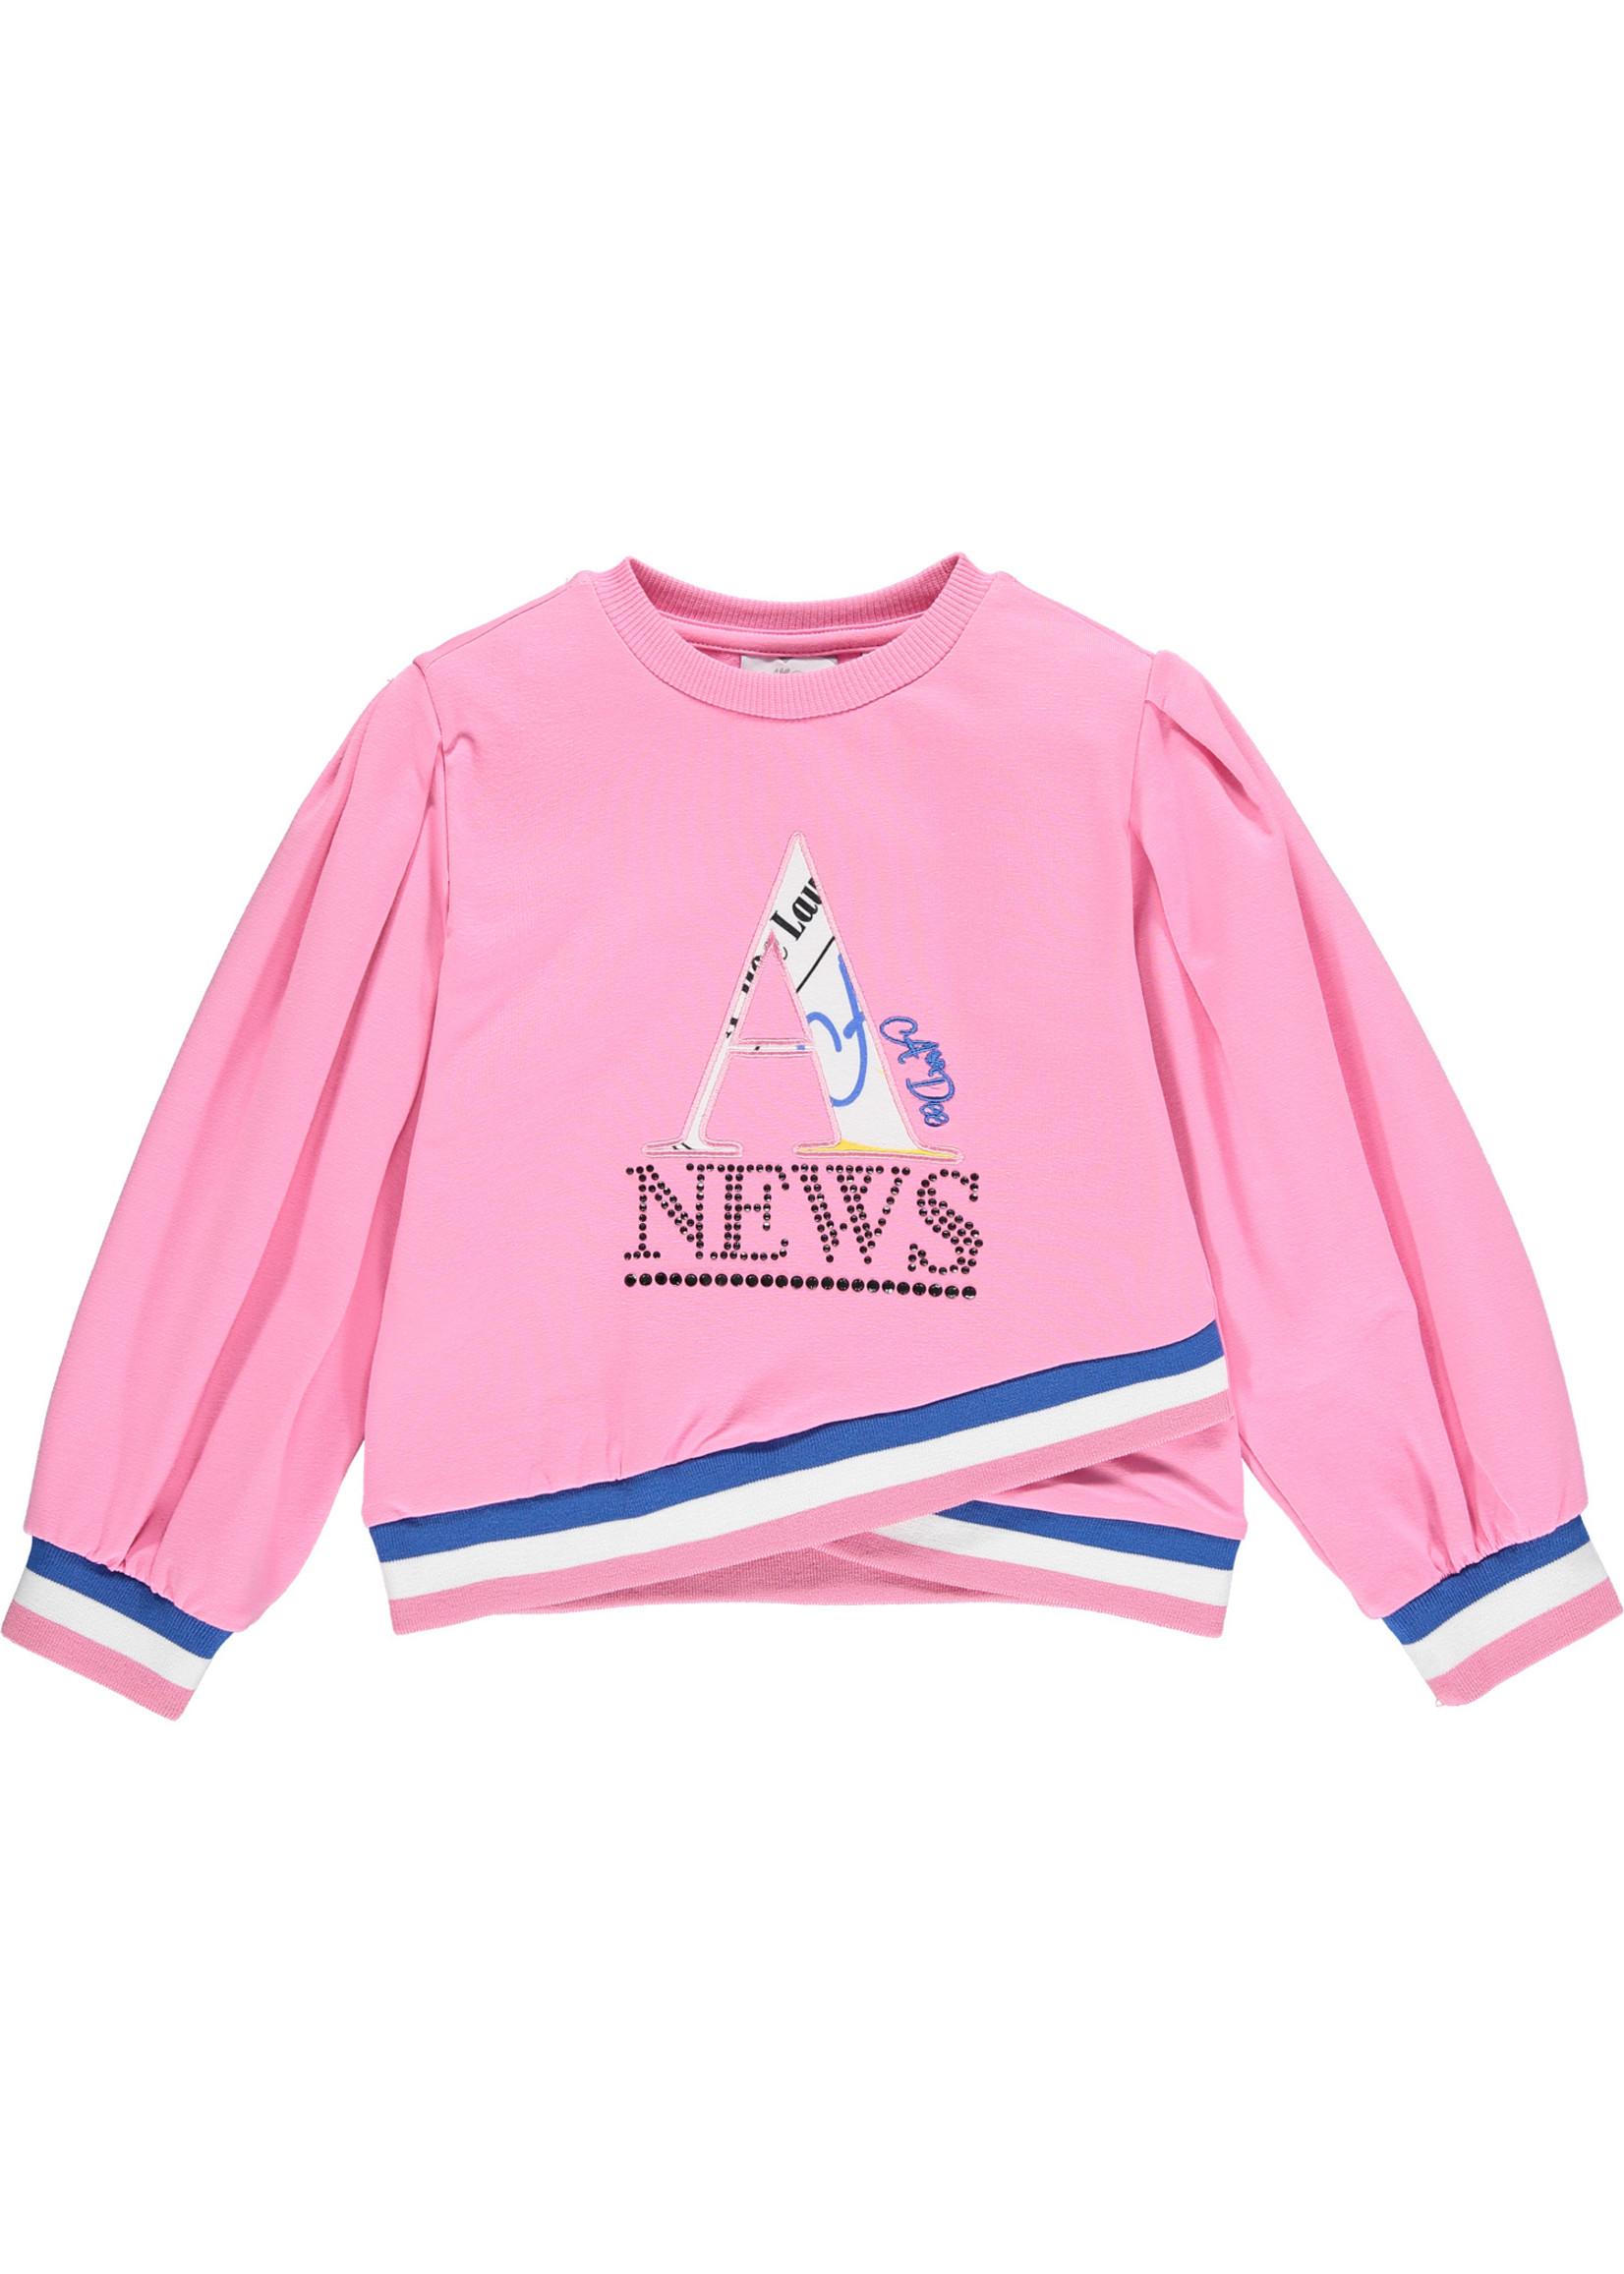 A Dee A Dee SIENNA Puff sleeve A News tracksuit